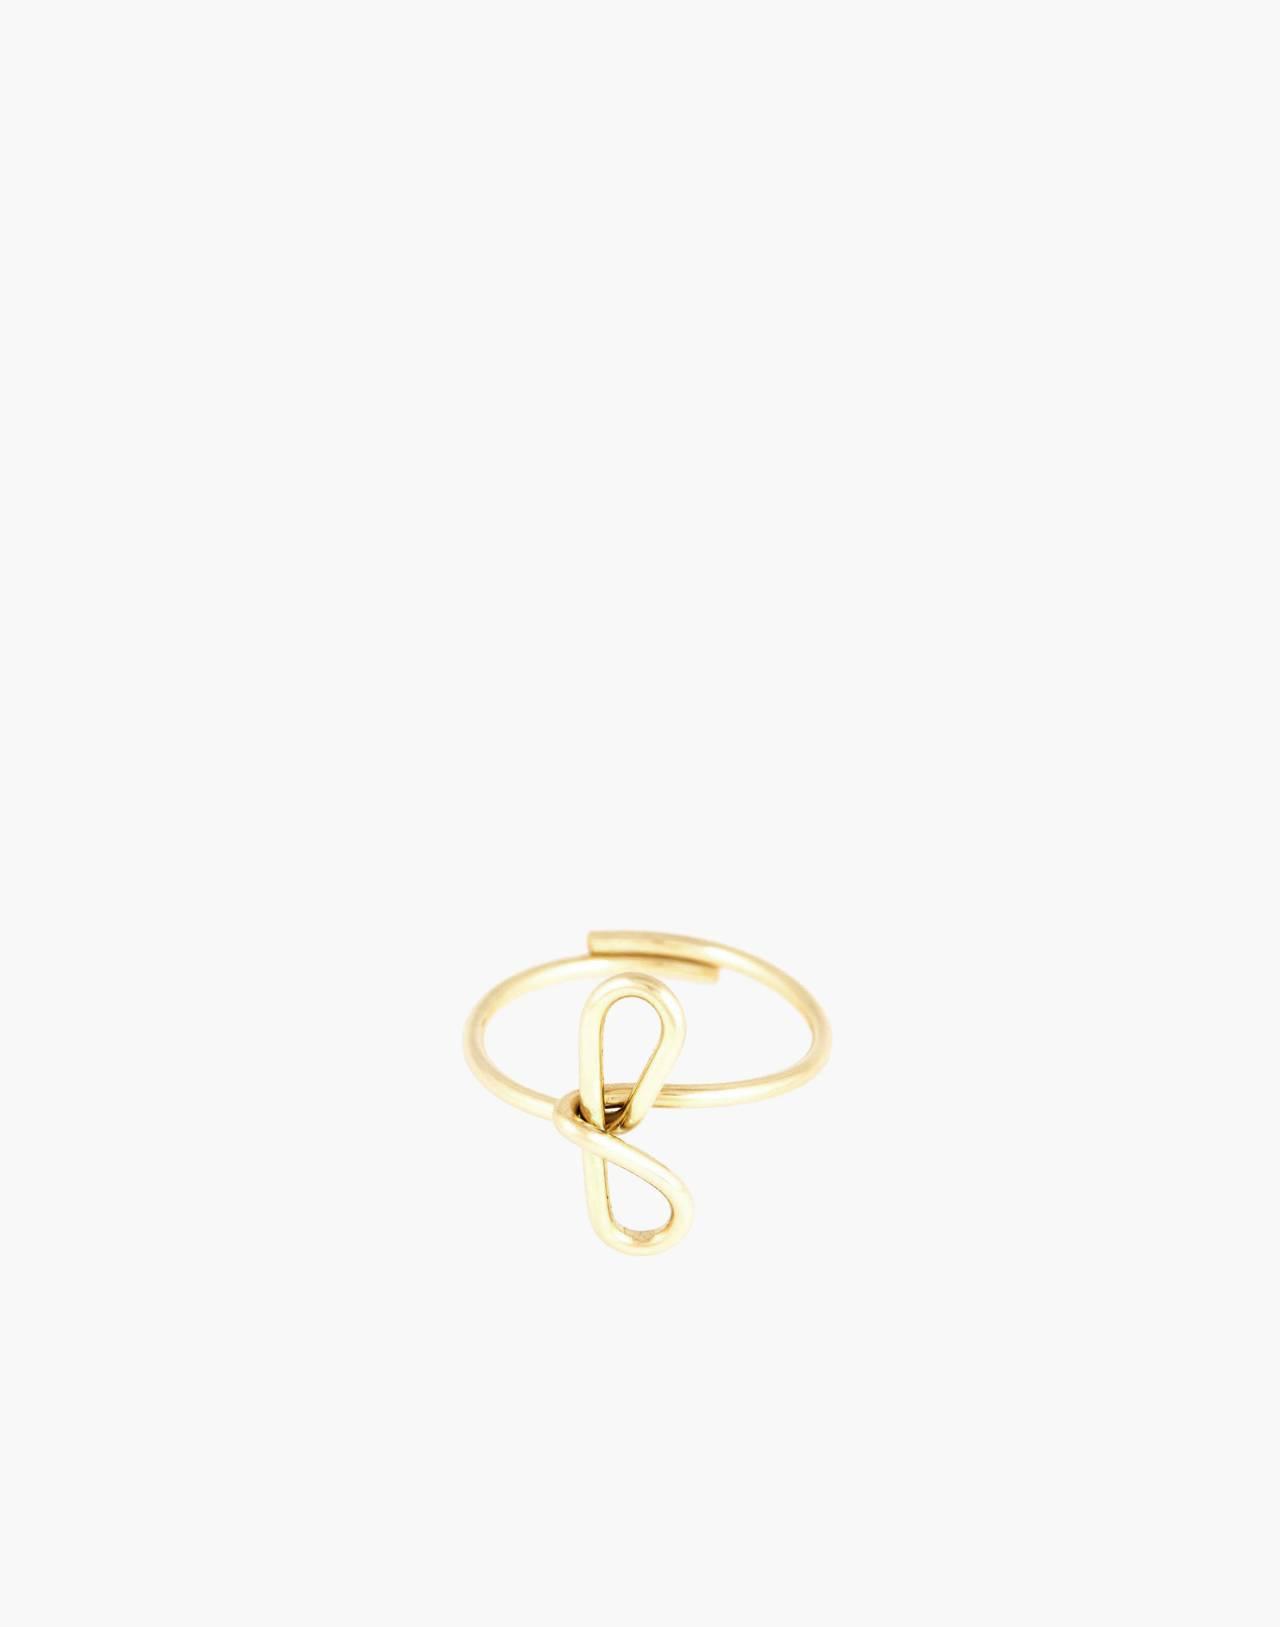 Atelier Paulin™ Poetic Letter Ring in letter f image 1